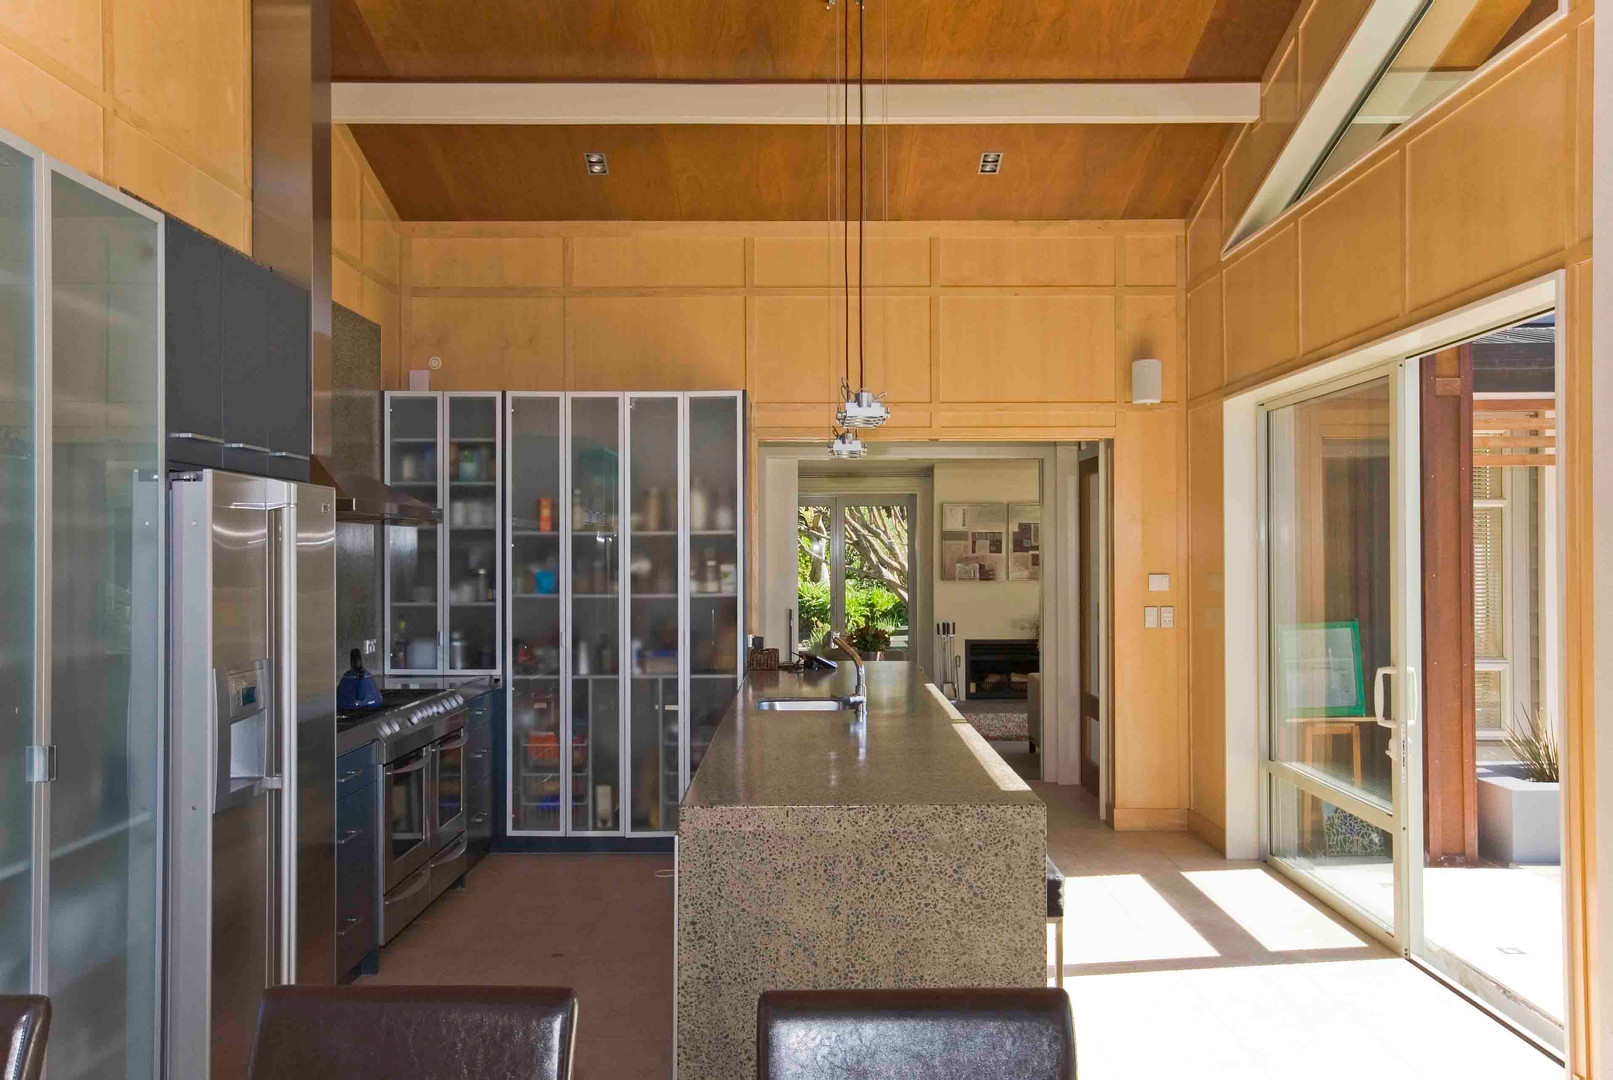 Vibert House Interior